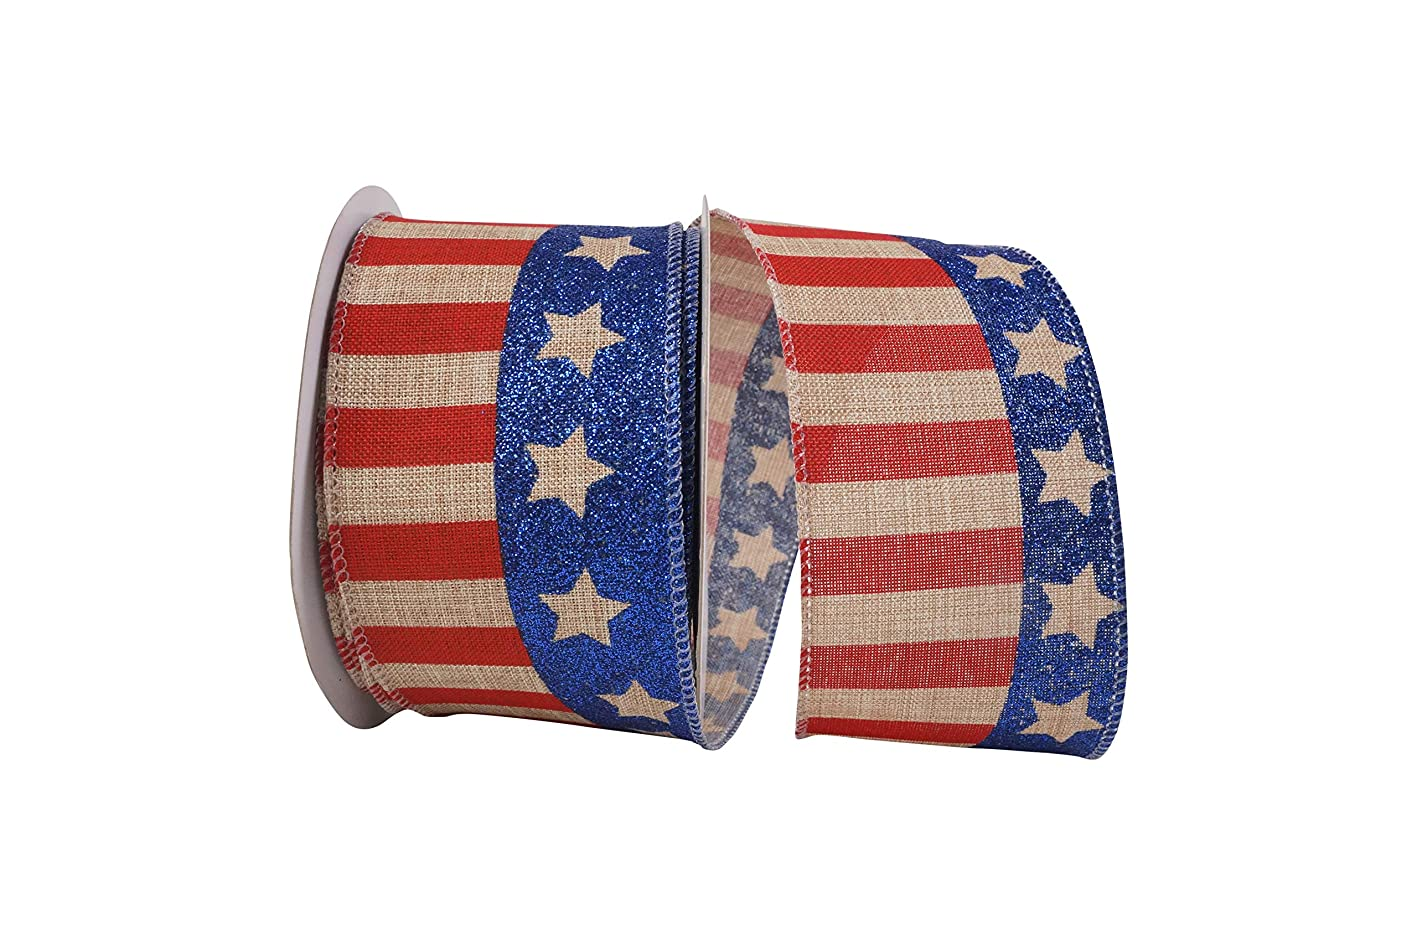 Reliant Ribbon 93104W-750-40F Flag Stripe Glitter Linen Wired Edge Ribbon, 2-1/2 Inch X 10 Yards, Natural jcxcpeopzih070